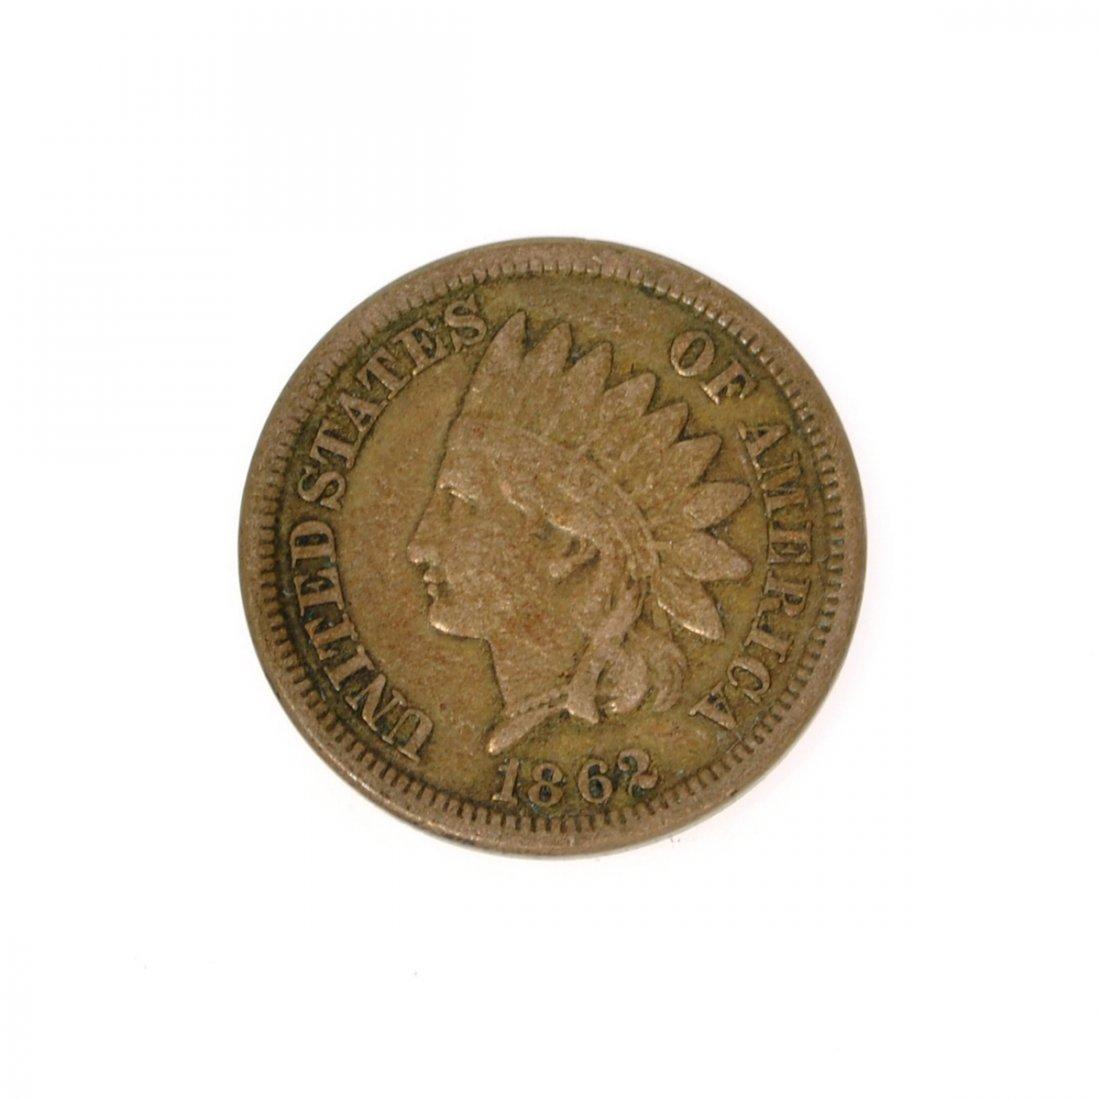 Rare 1862 Indian Cent Coin